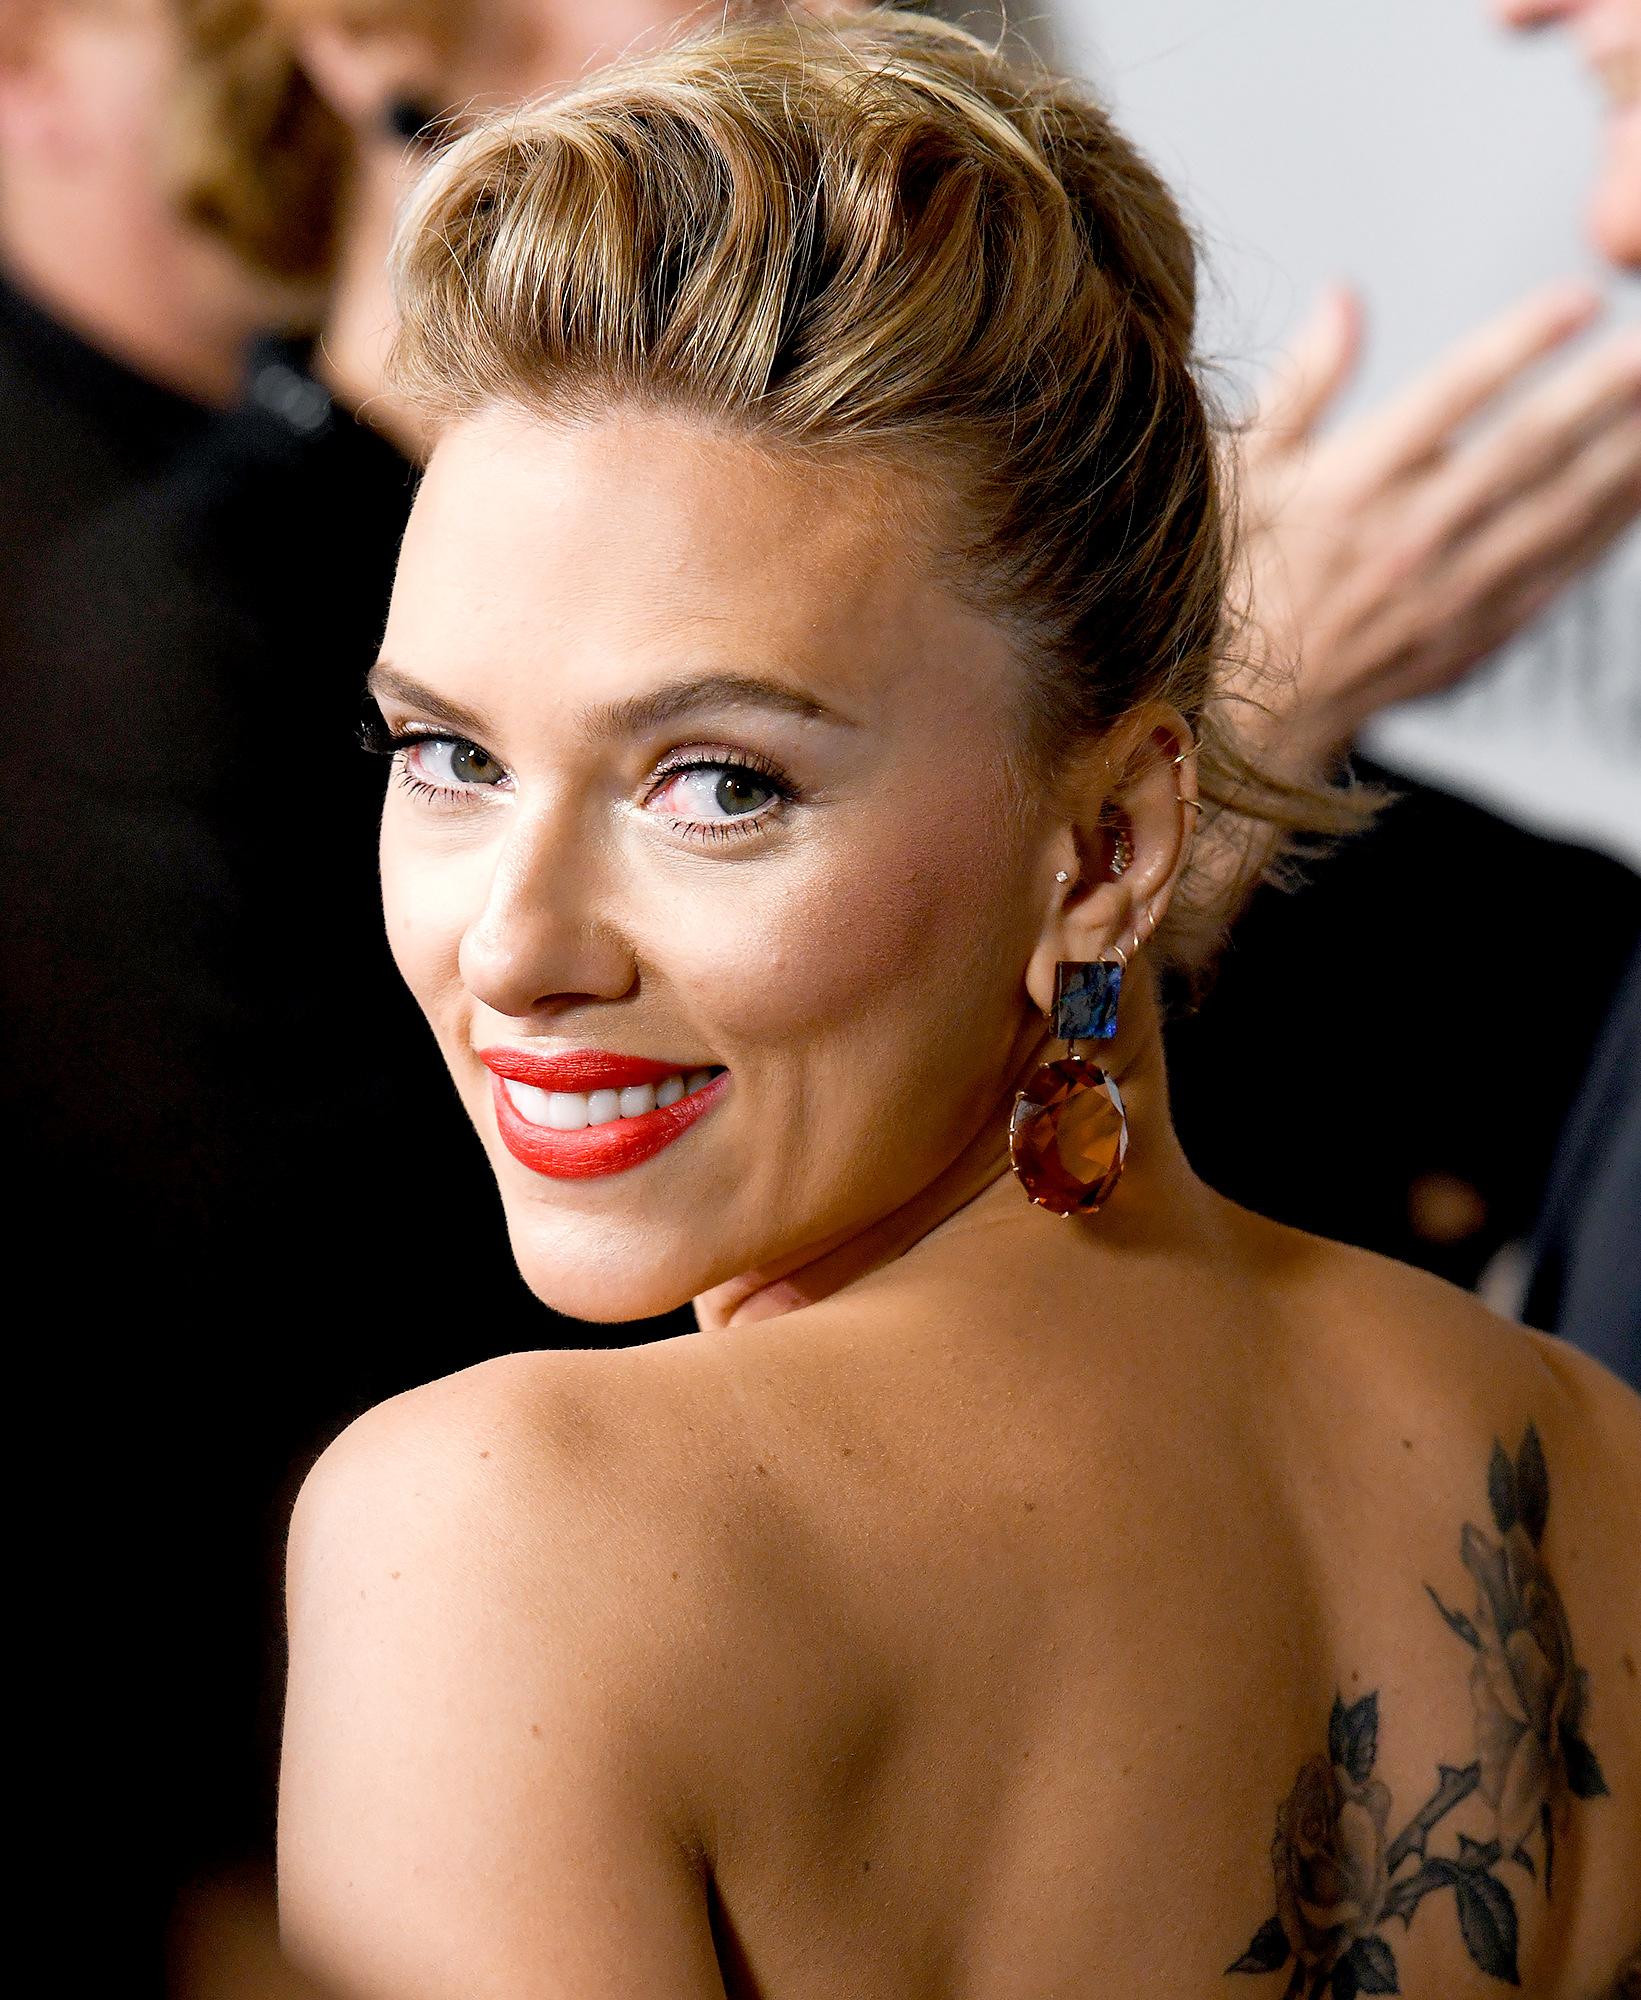 Scarlett Johansson Reveals 1 Thing She Colin Jost Disagree On